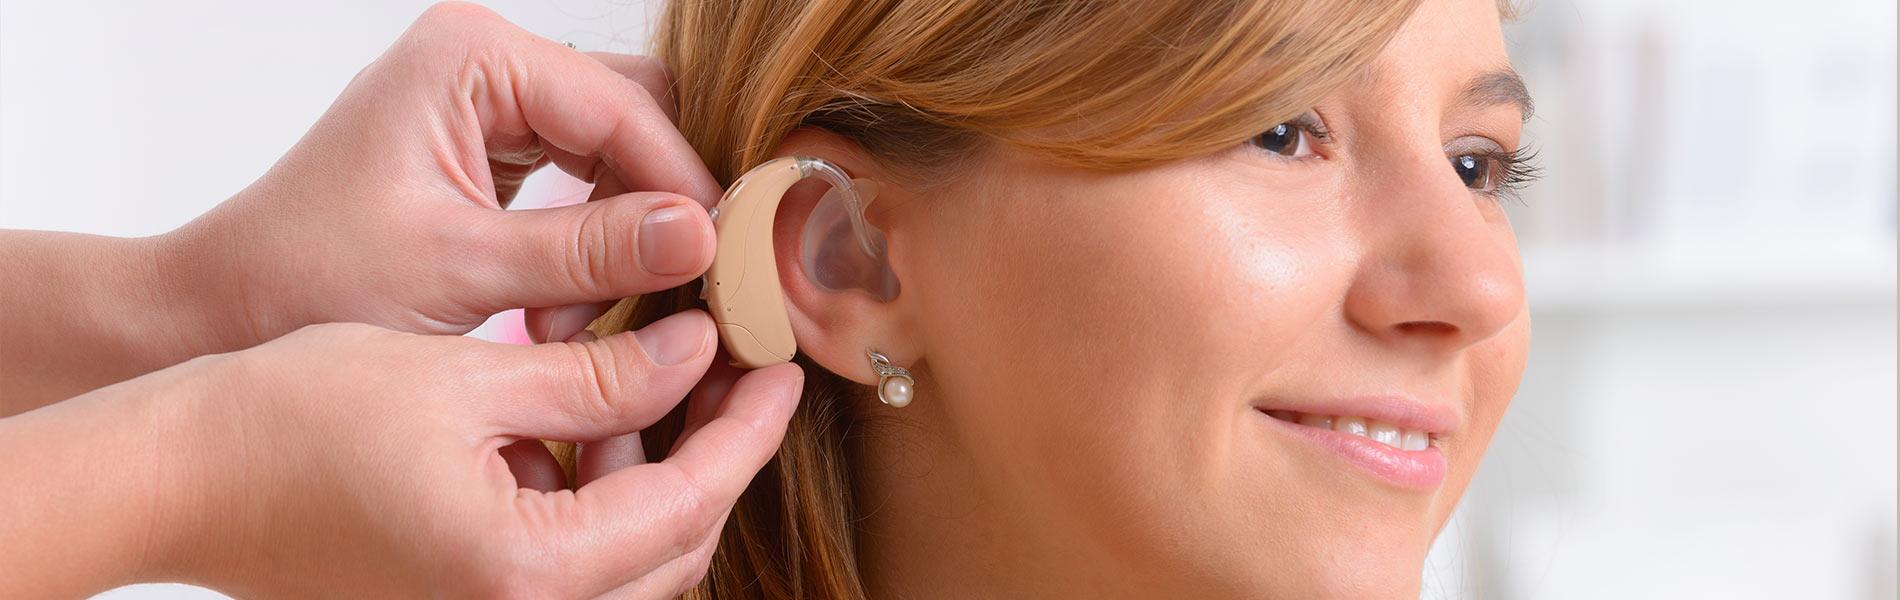 hearing-aids